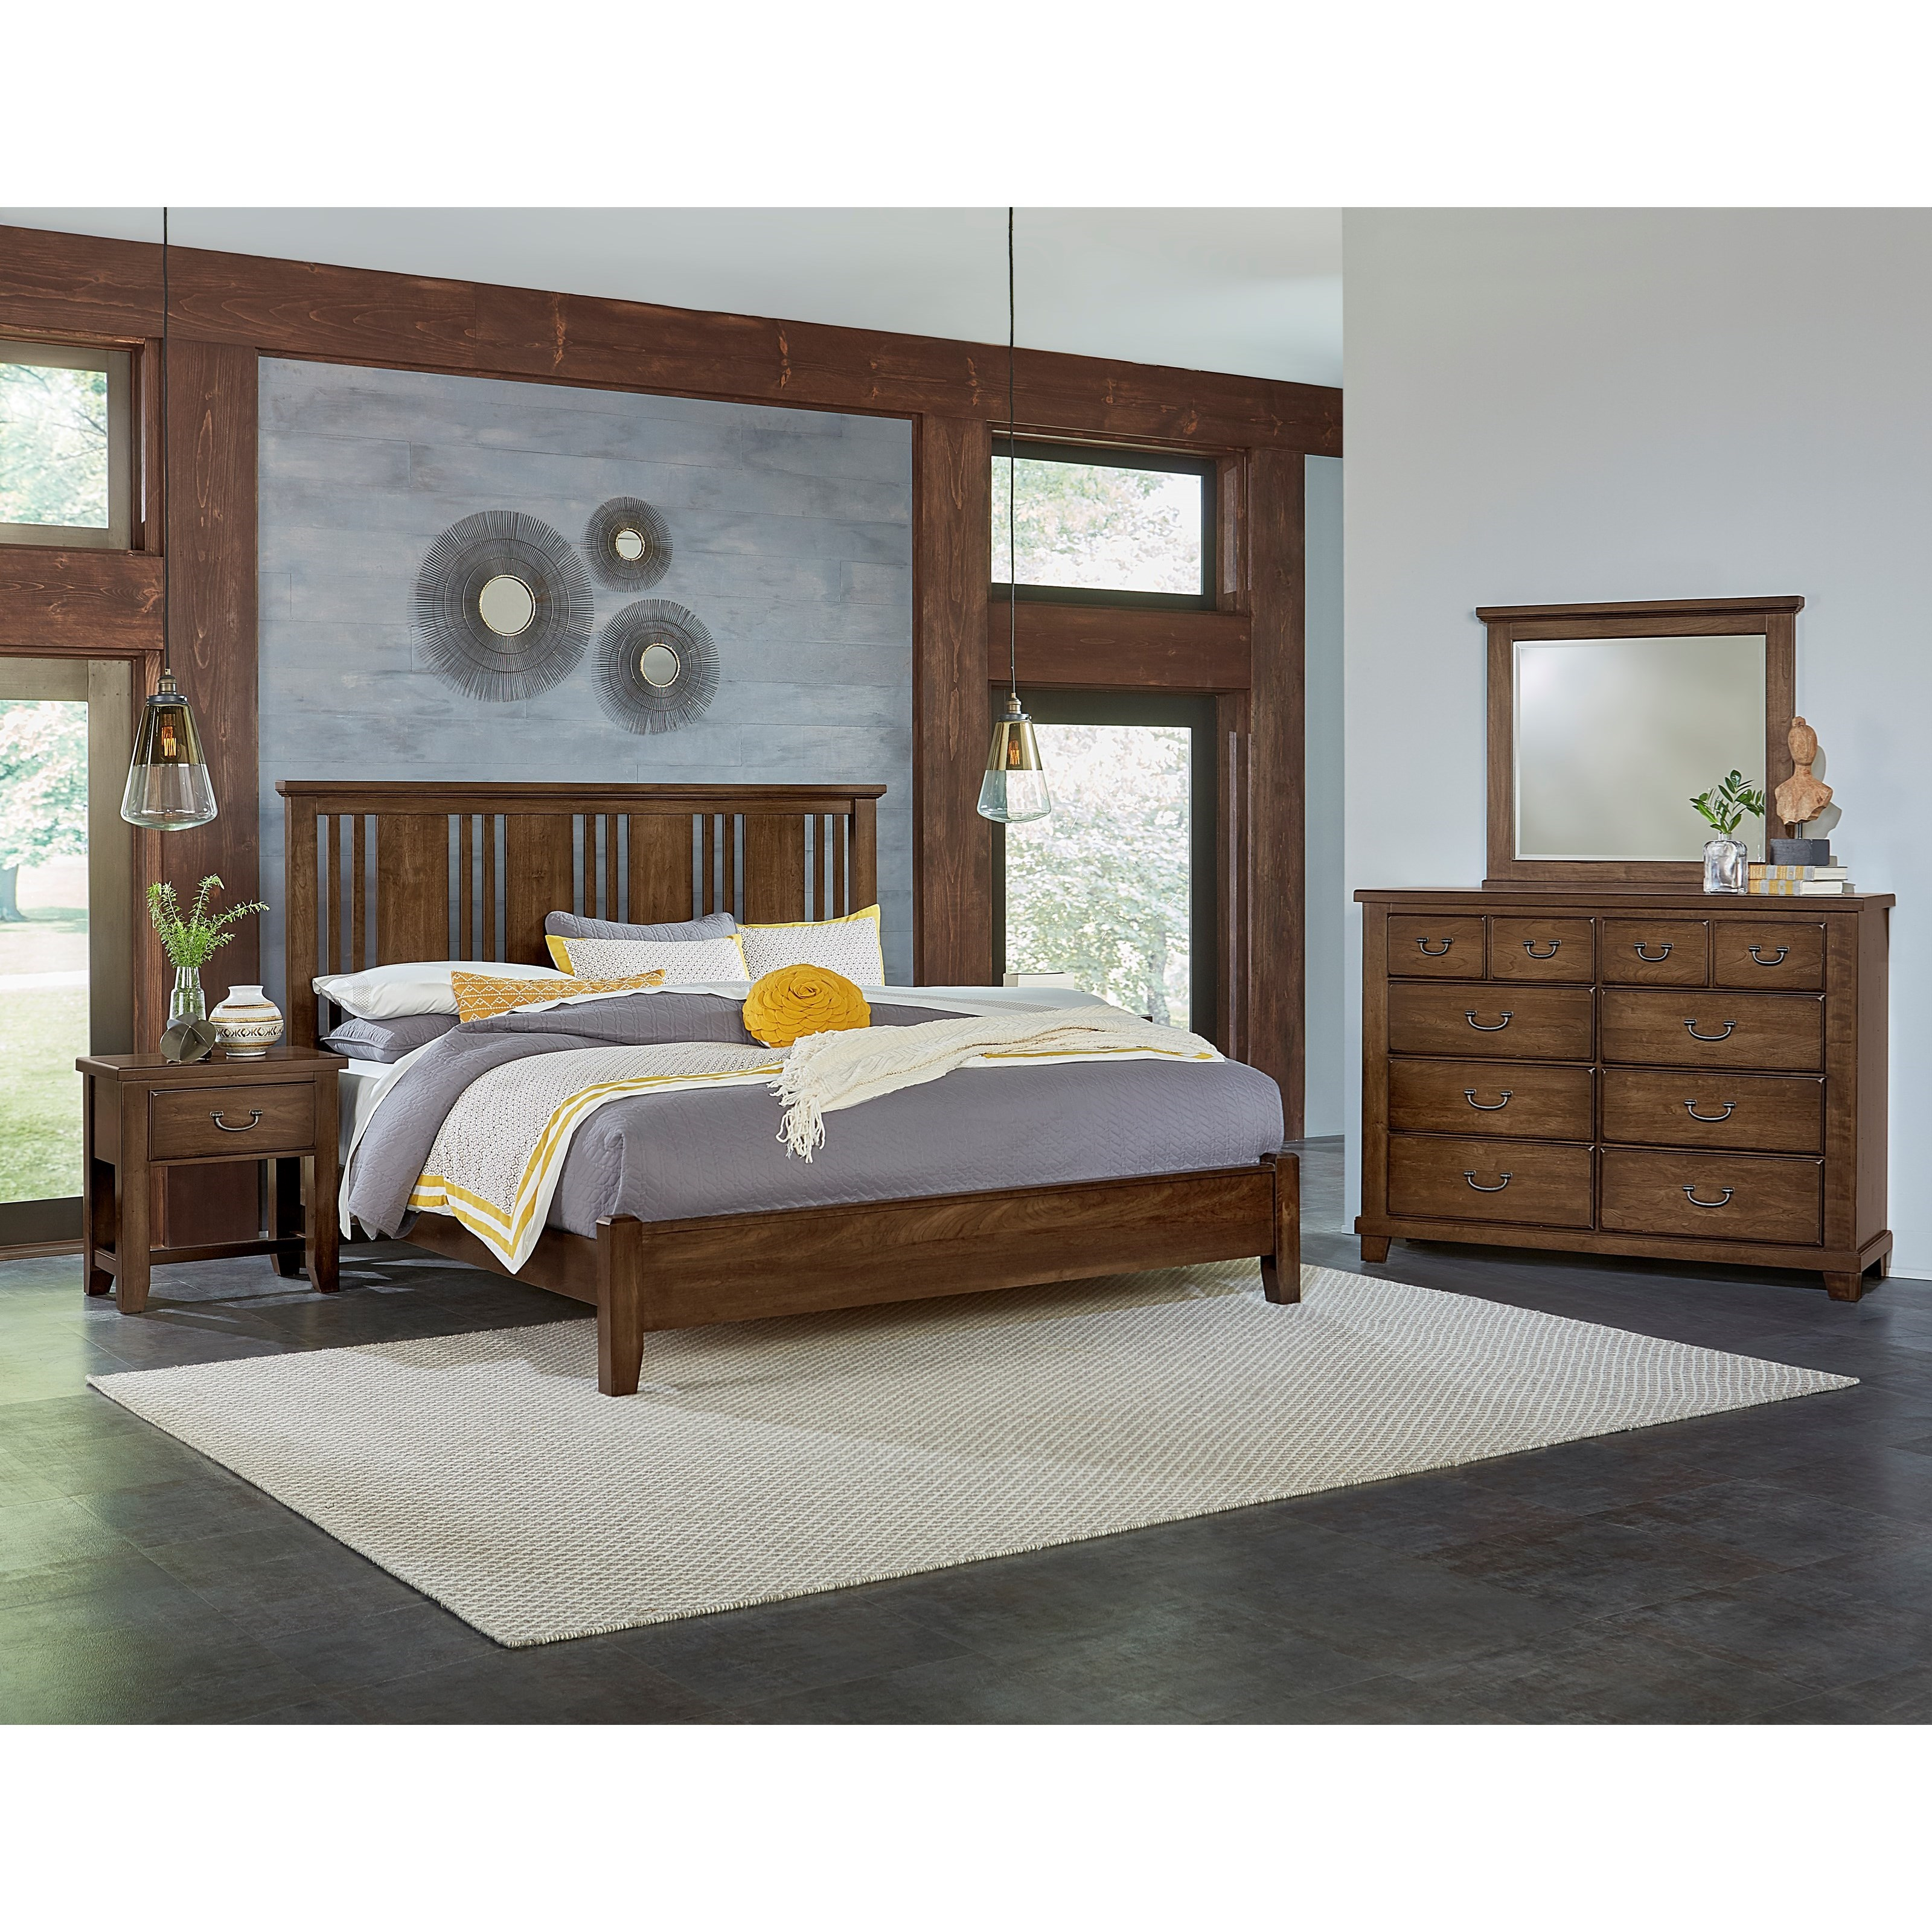 Vaughan bassett american cherry king bedroom group for Bedroom groups